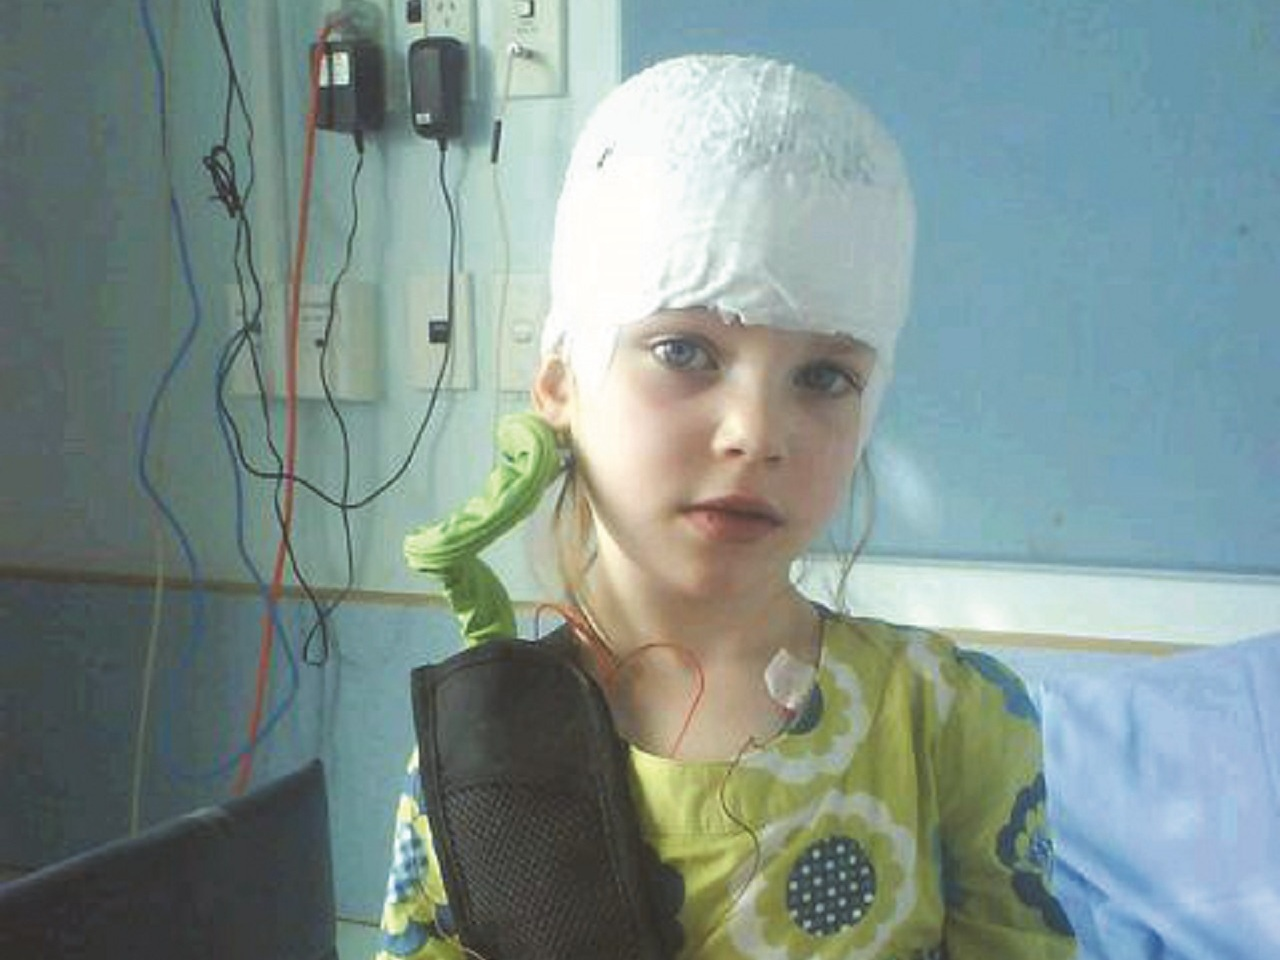 Starship neurosurgery patient, Mia Rennie